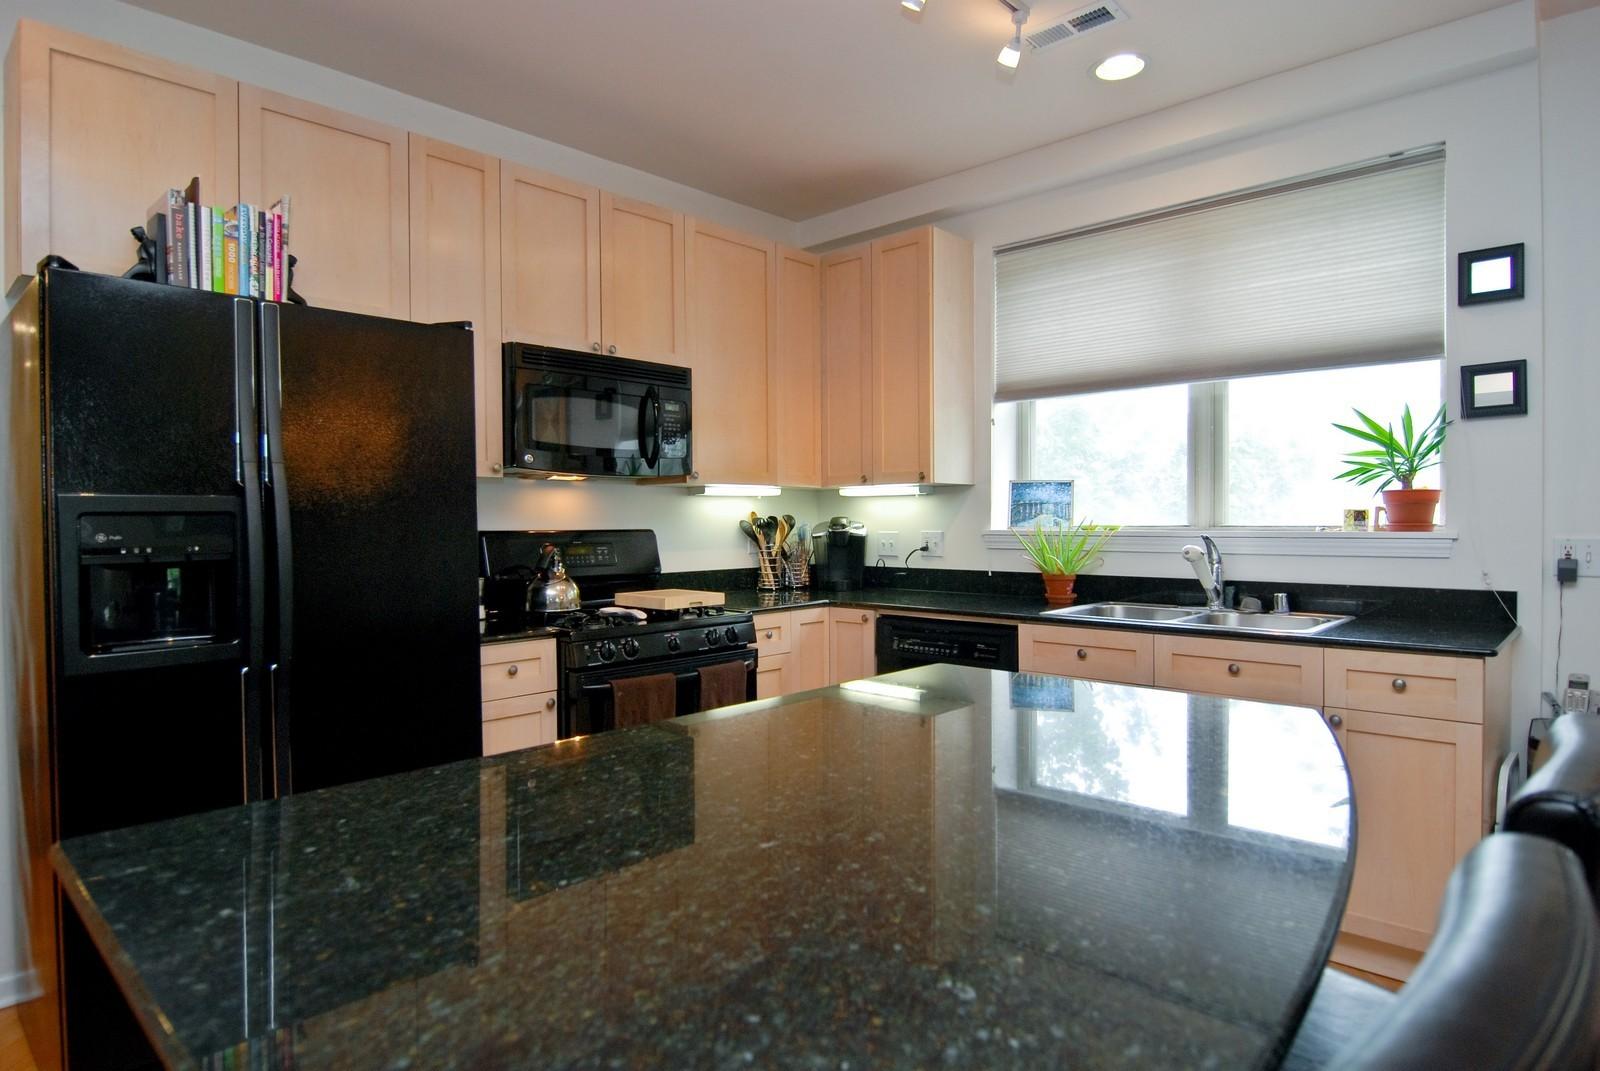 Real Estate Photography - 2869 W Palmer, Unit 3, Chicago, IL, 60647 - Kitchen